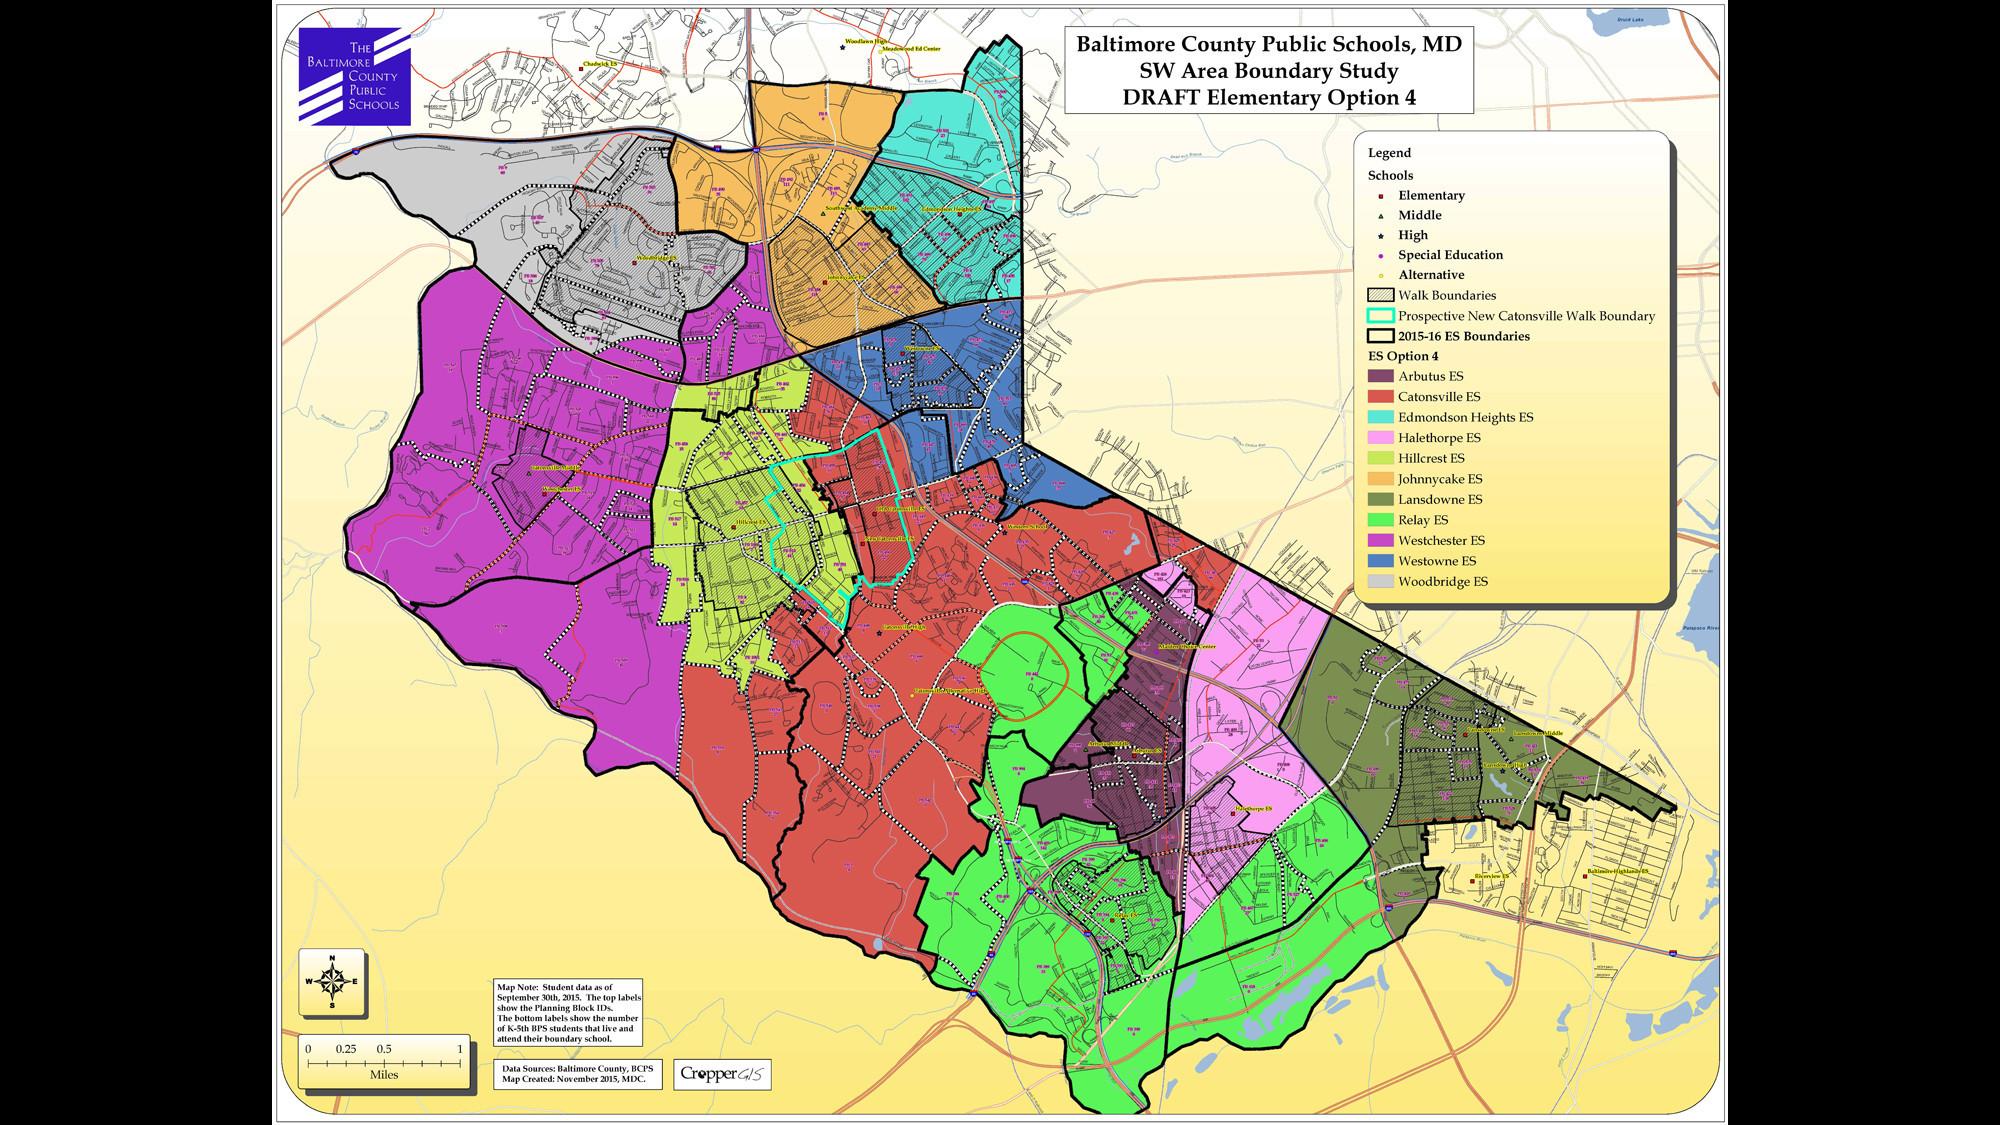 Baltimore County Public Schools Southwest Area Boundary Study maps ...